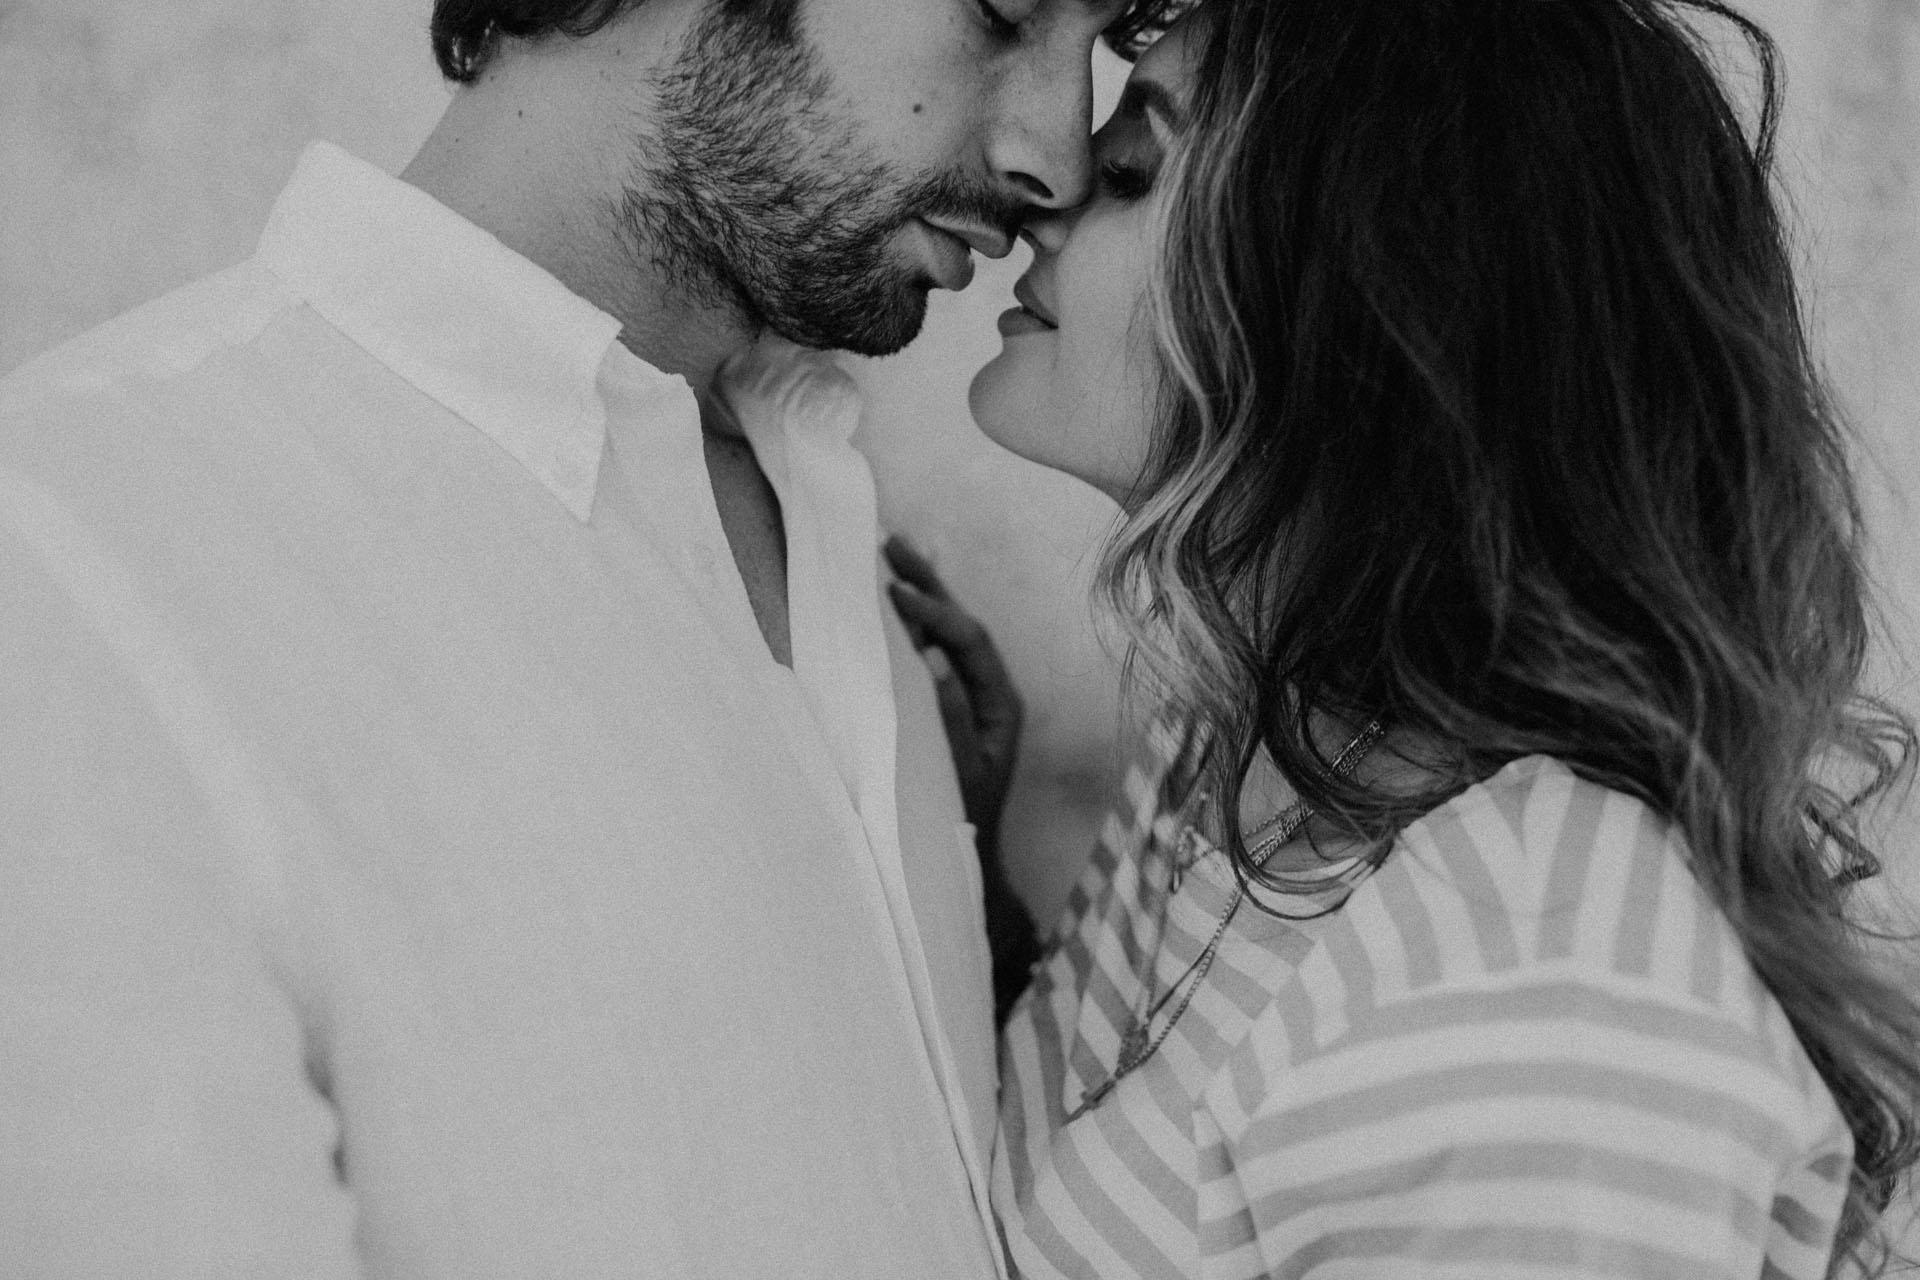 coupleshooting-roma-hochzeitsfotografen-wien-agnesundandi-13